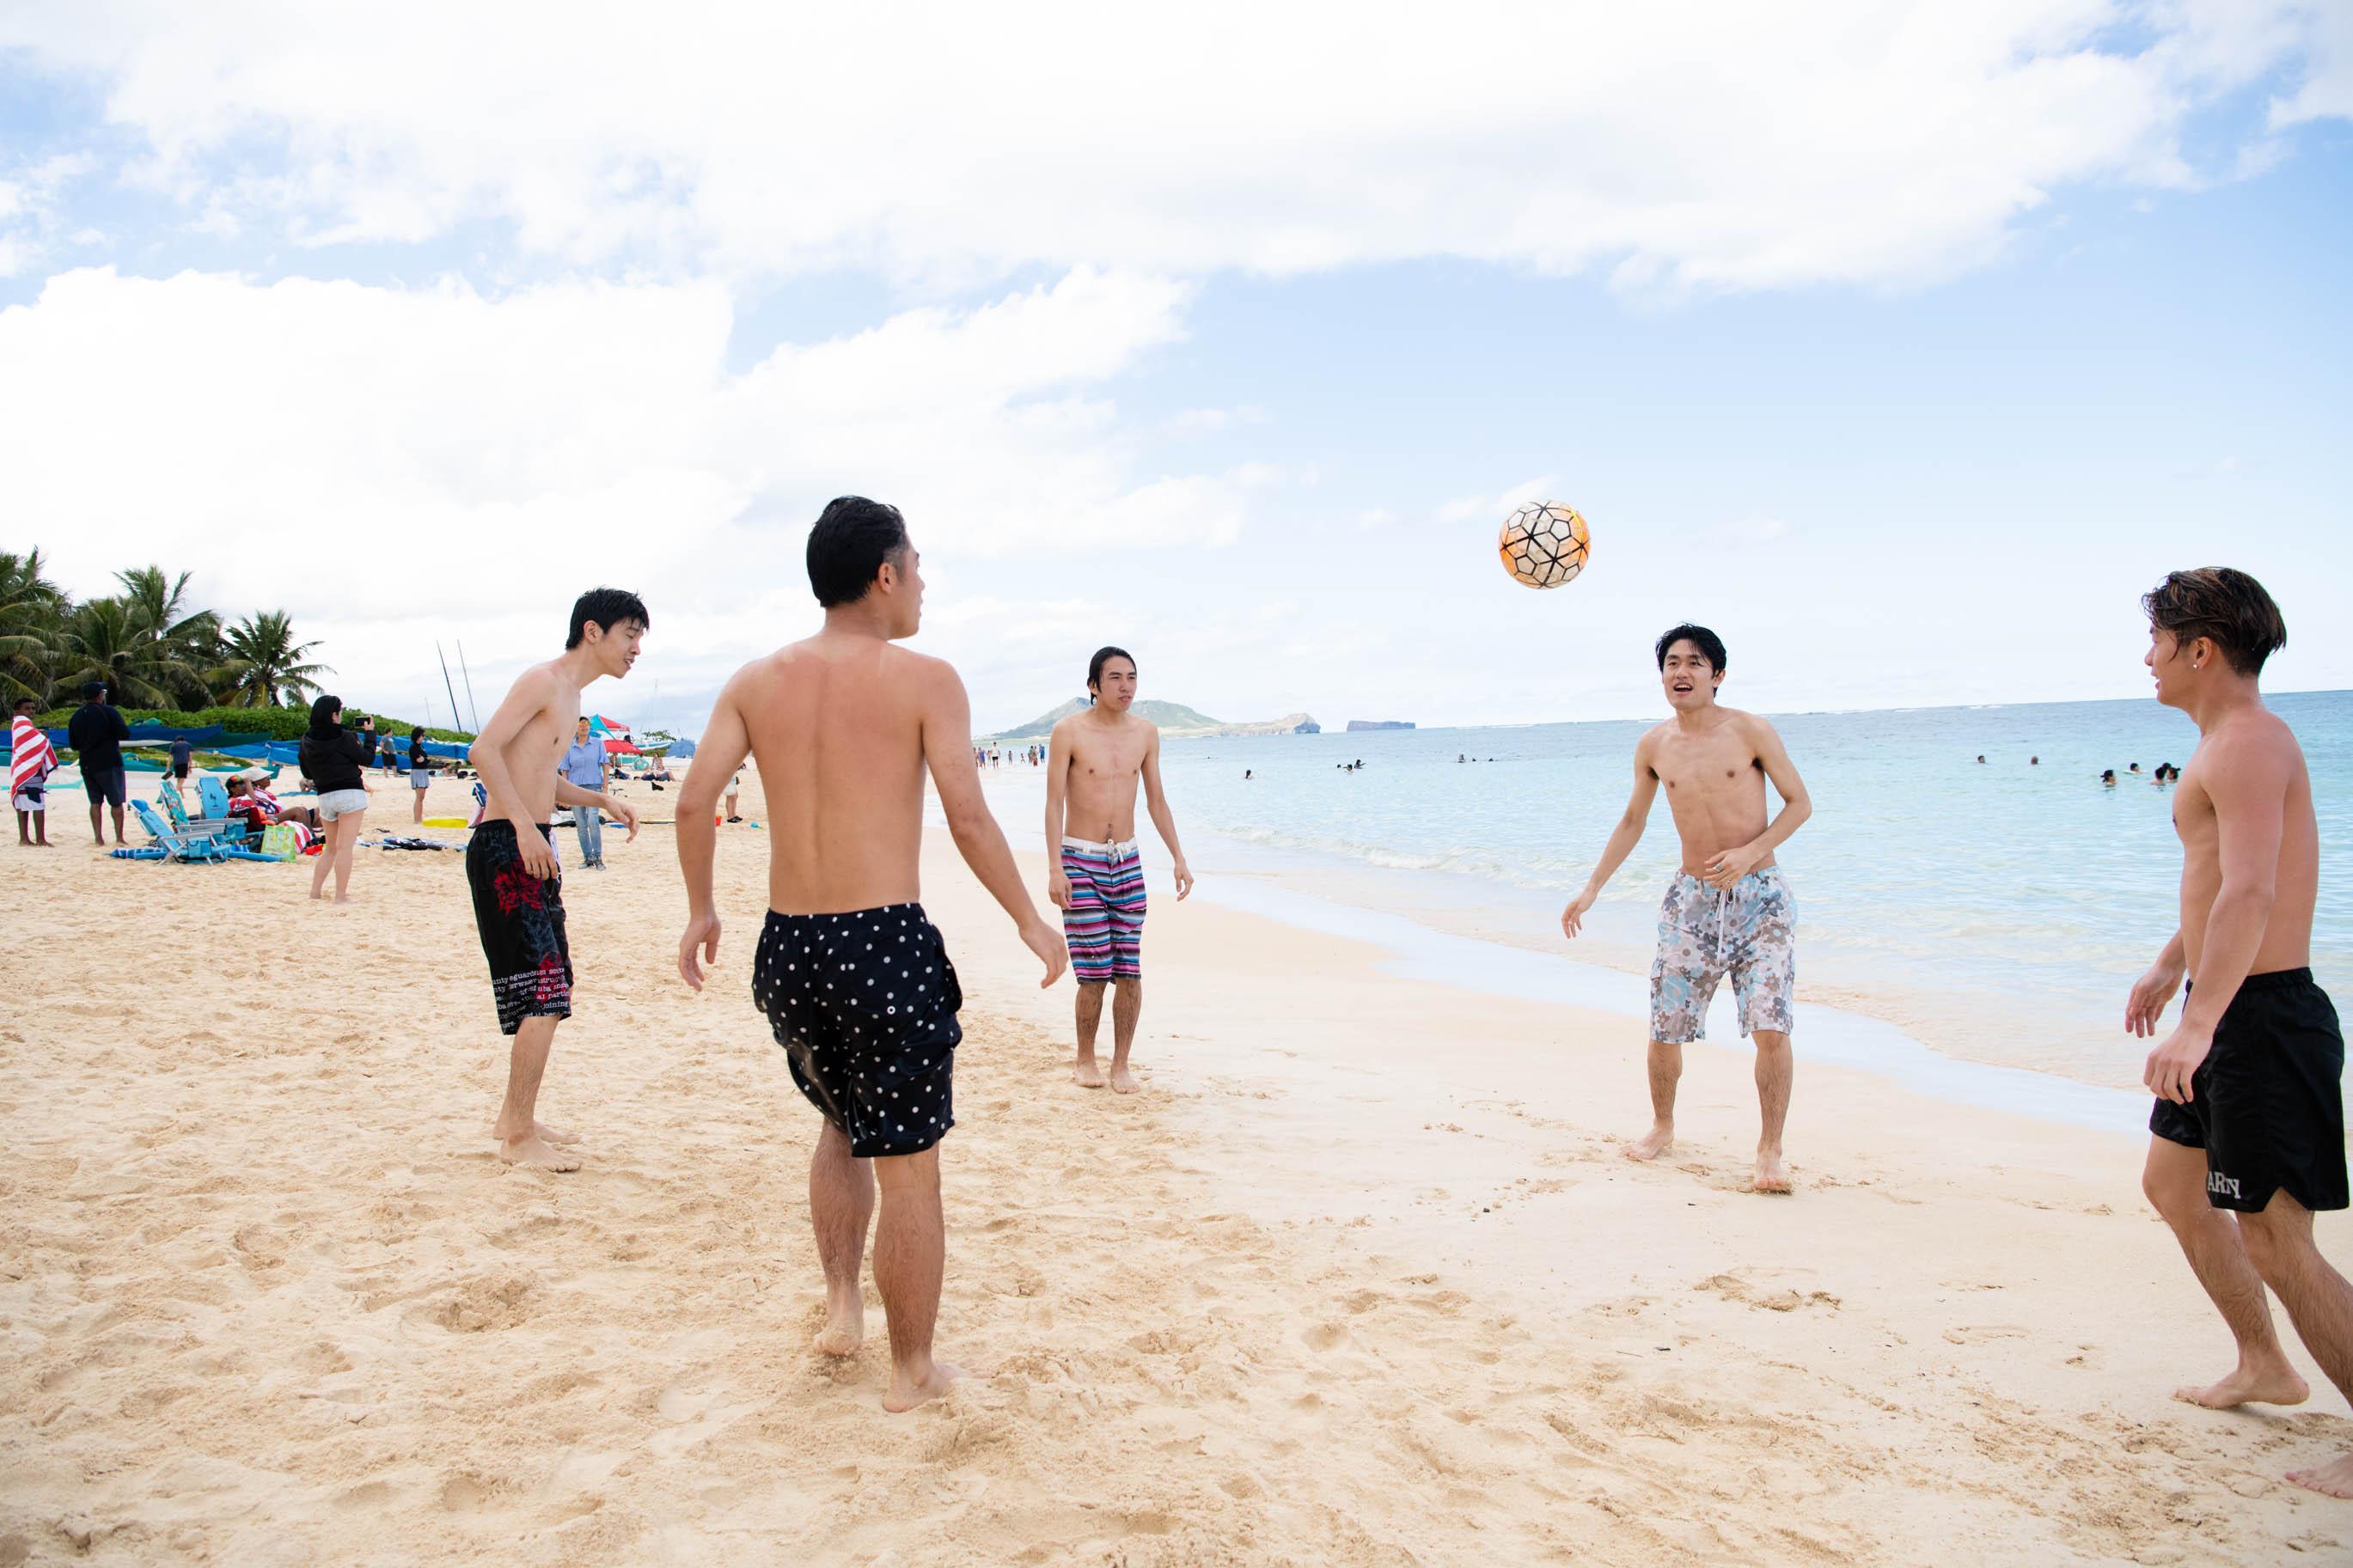 HAWAI'I FUTSAL CUP 2020(ハワイフットサルカップ2020)